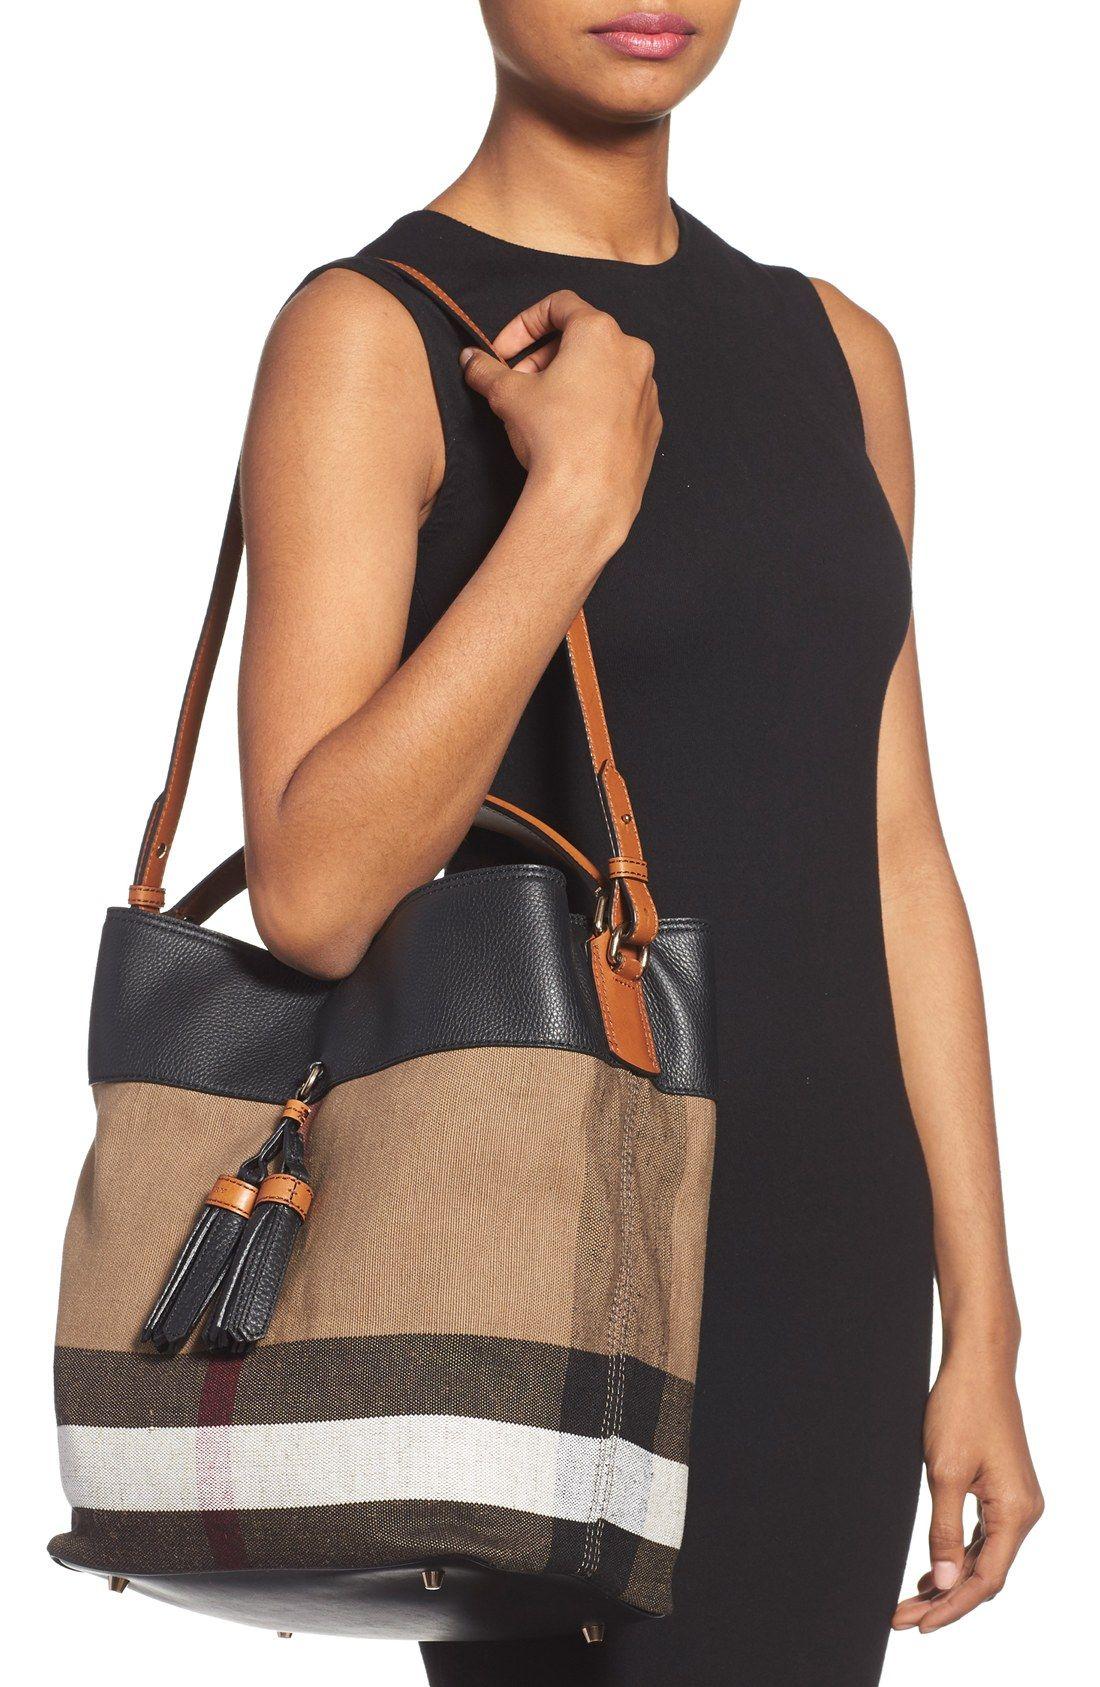 ba4fa3cd9d Burberry 'Medium Susanna' Check Bucket Bag Leather Tassel, Pebbled Leather,  Signature Style